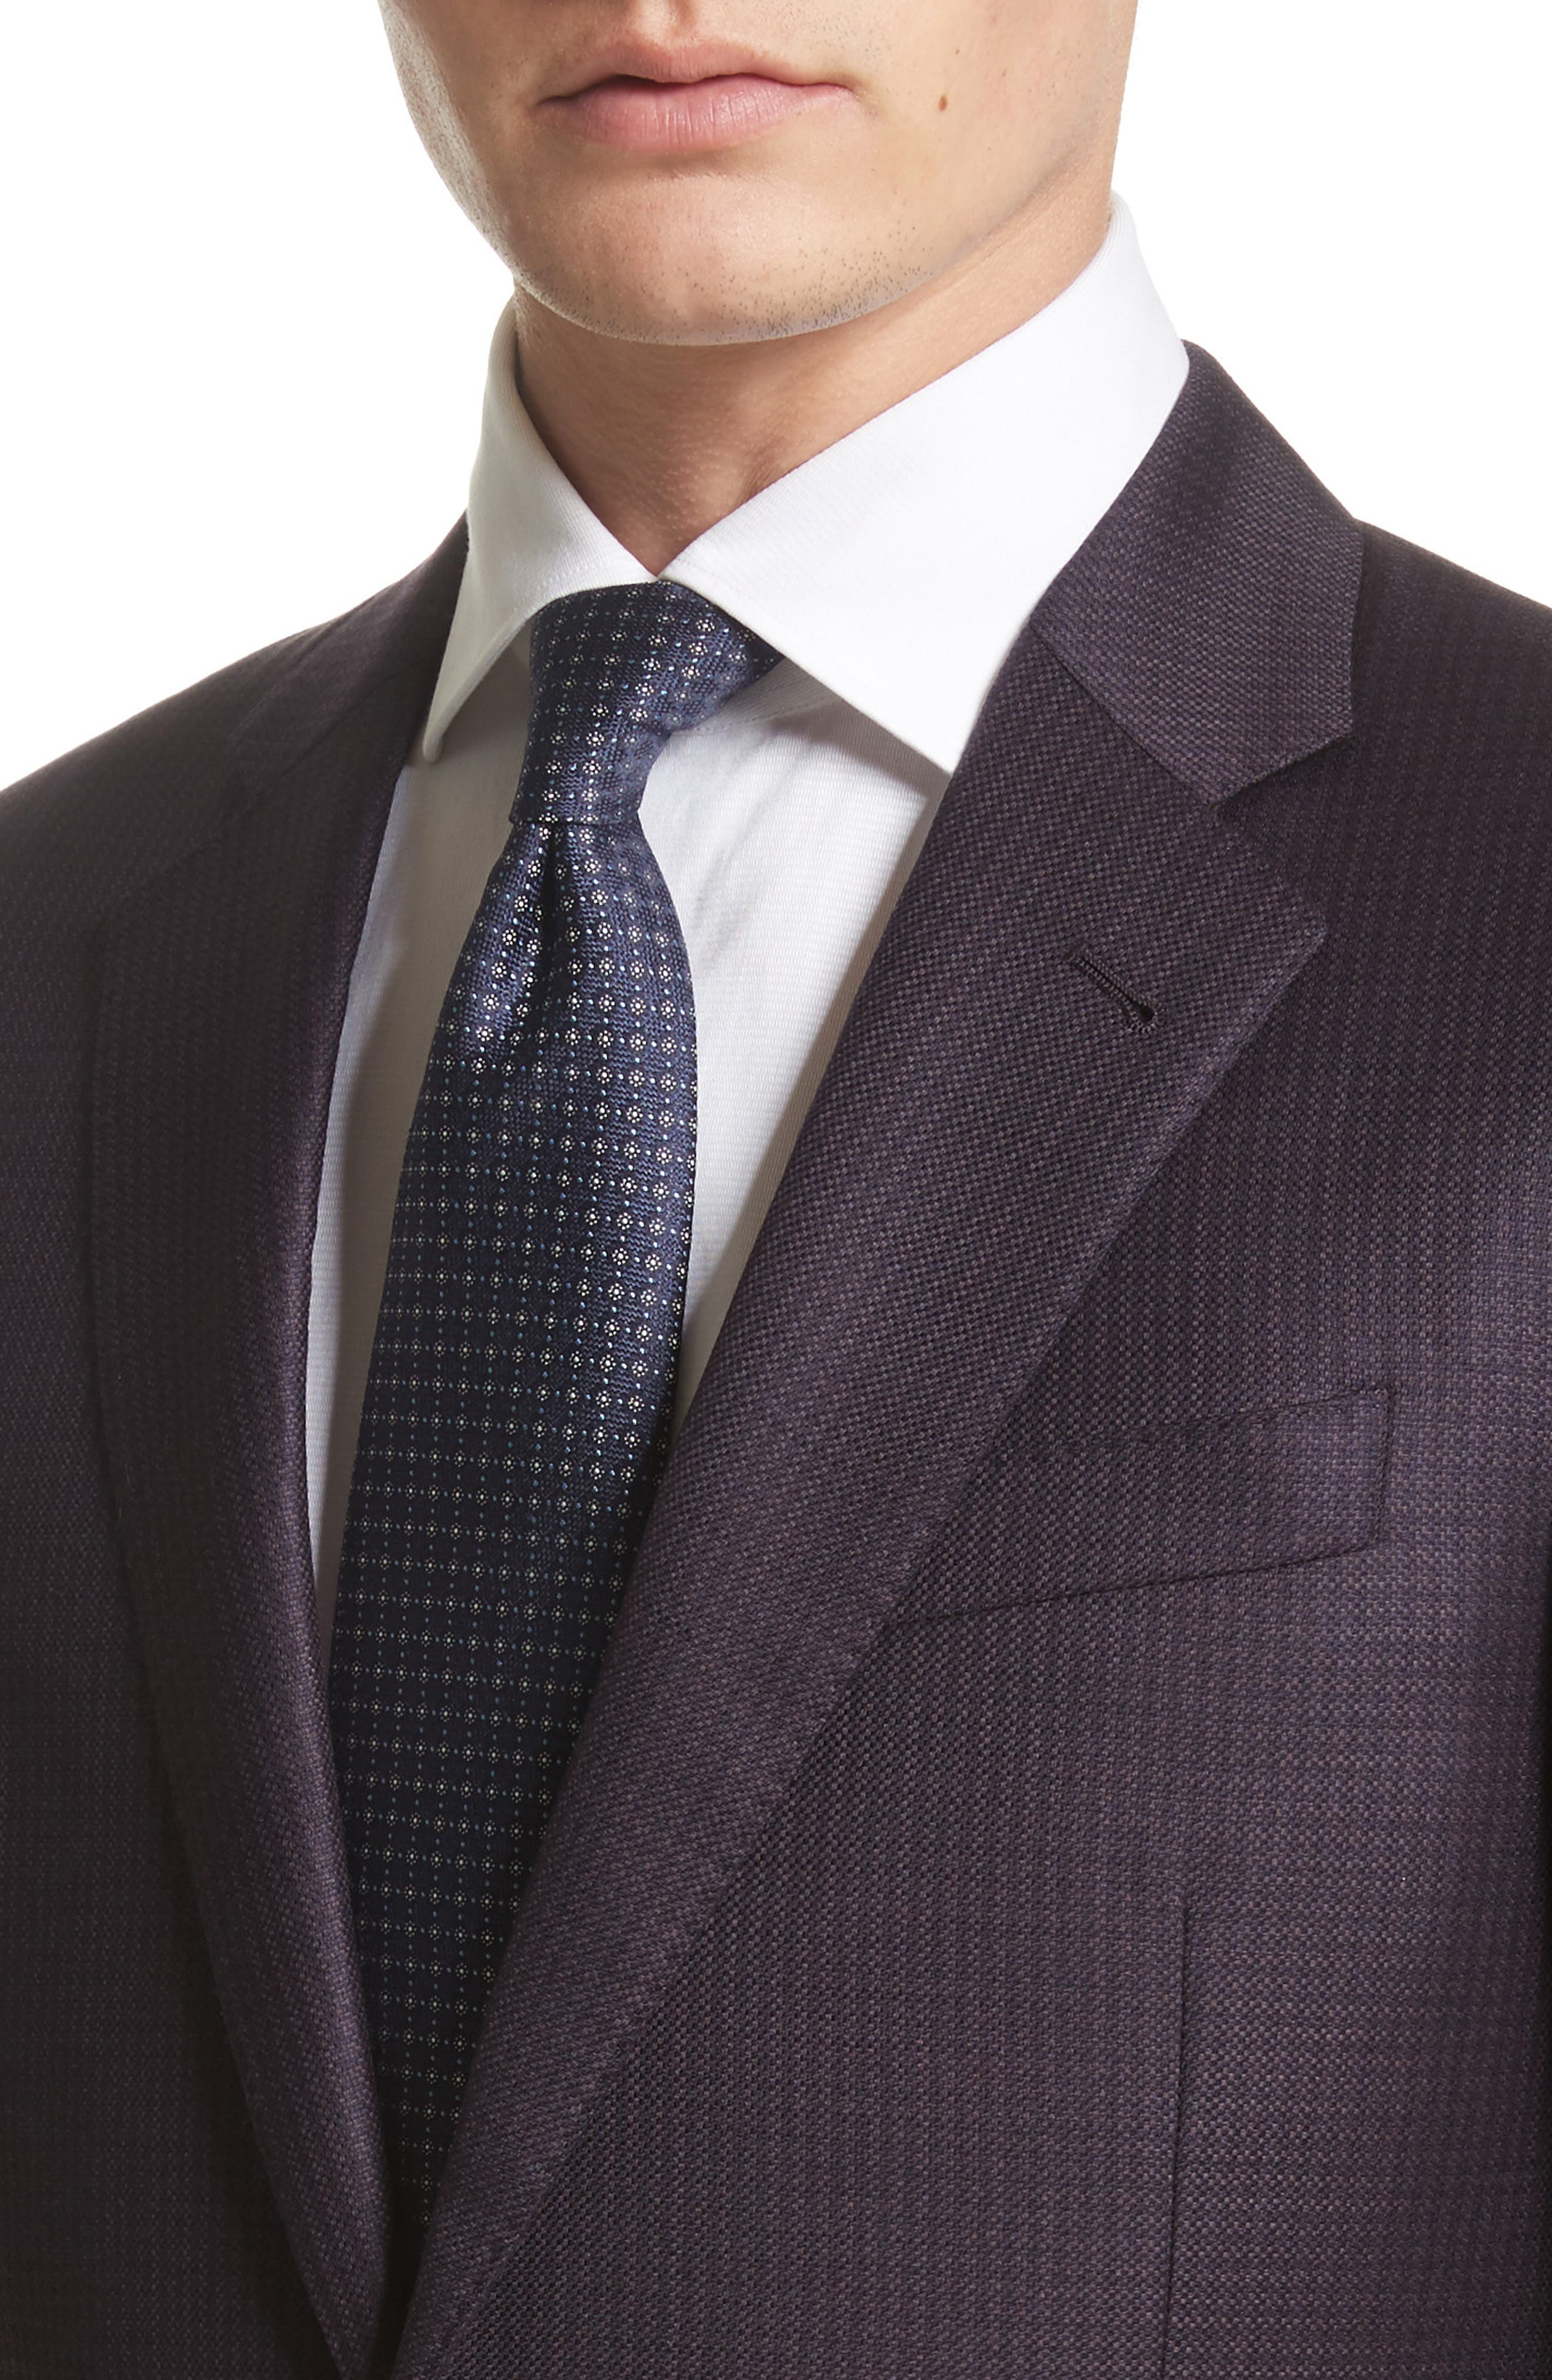 G-Line Trim Fit Houndstooth Wool Sport Coat,                             Alternate thumbnail 4, color,                             604